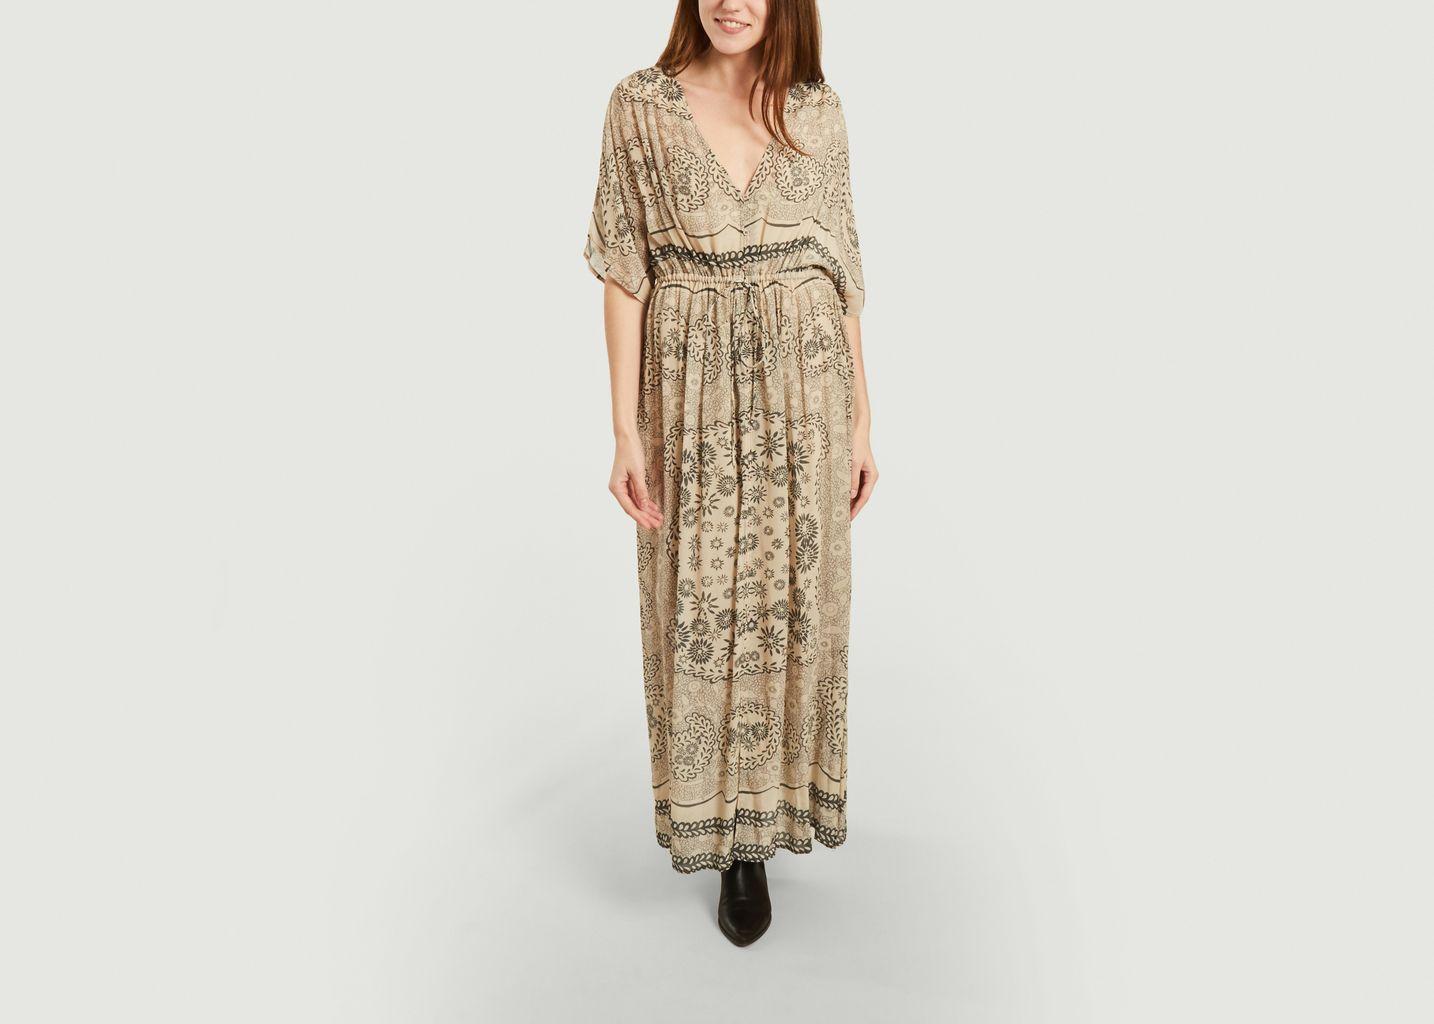 Robe Dounia - Swildens